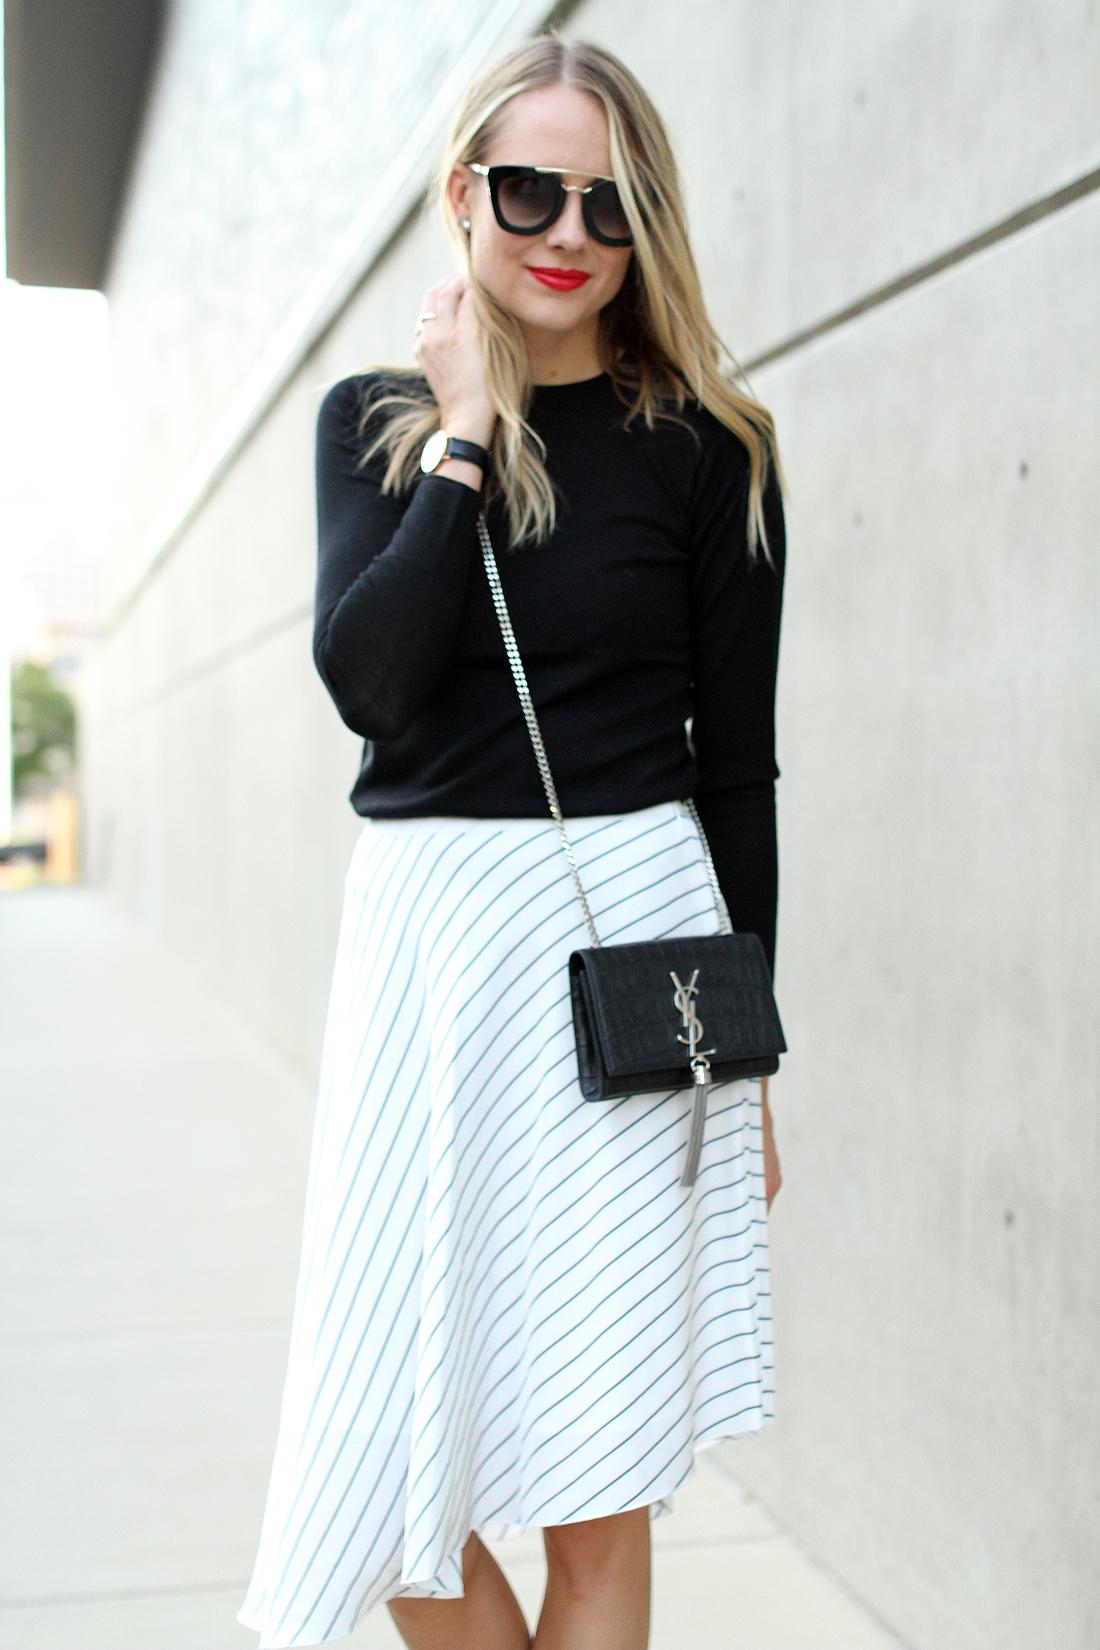 fashion-jackson-club-monaco-white-asymmetrical-skirt-black-sweater-prada-sunglasses-saint-laurent-tassel-crossbody